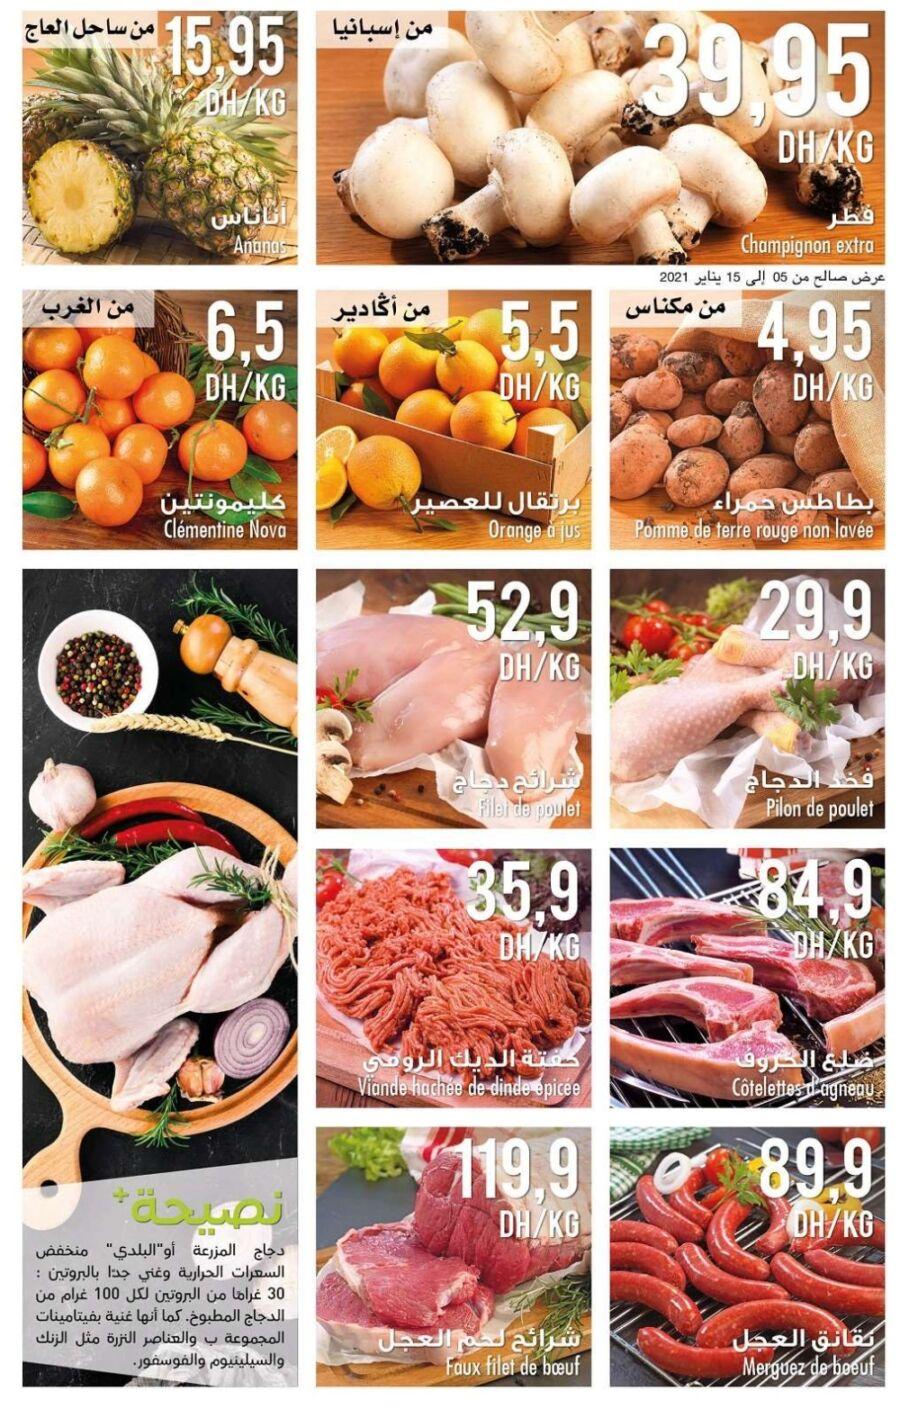 Catalogue Carrefour Market العروض الحصرية du 5 au 17 Janvier 2021